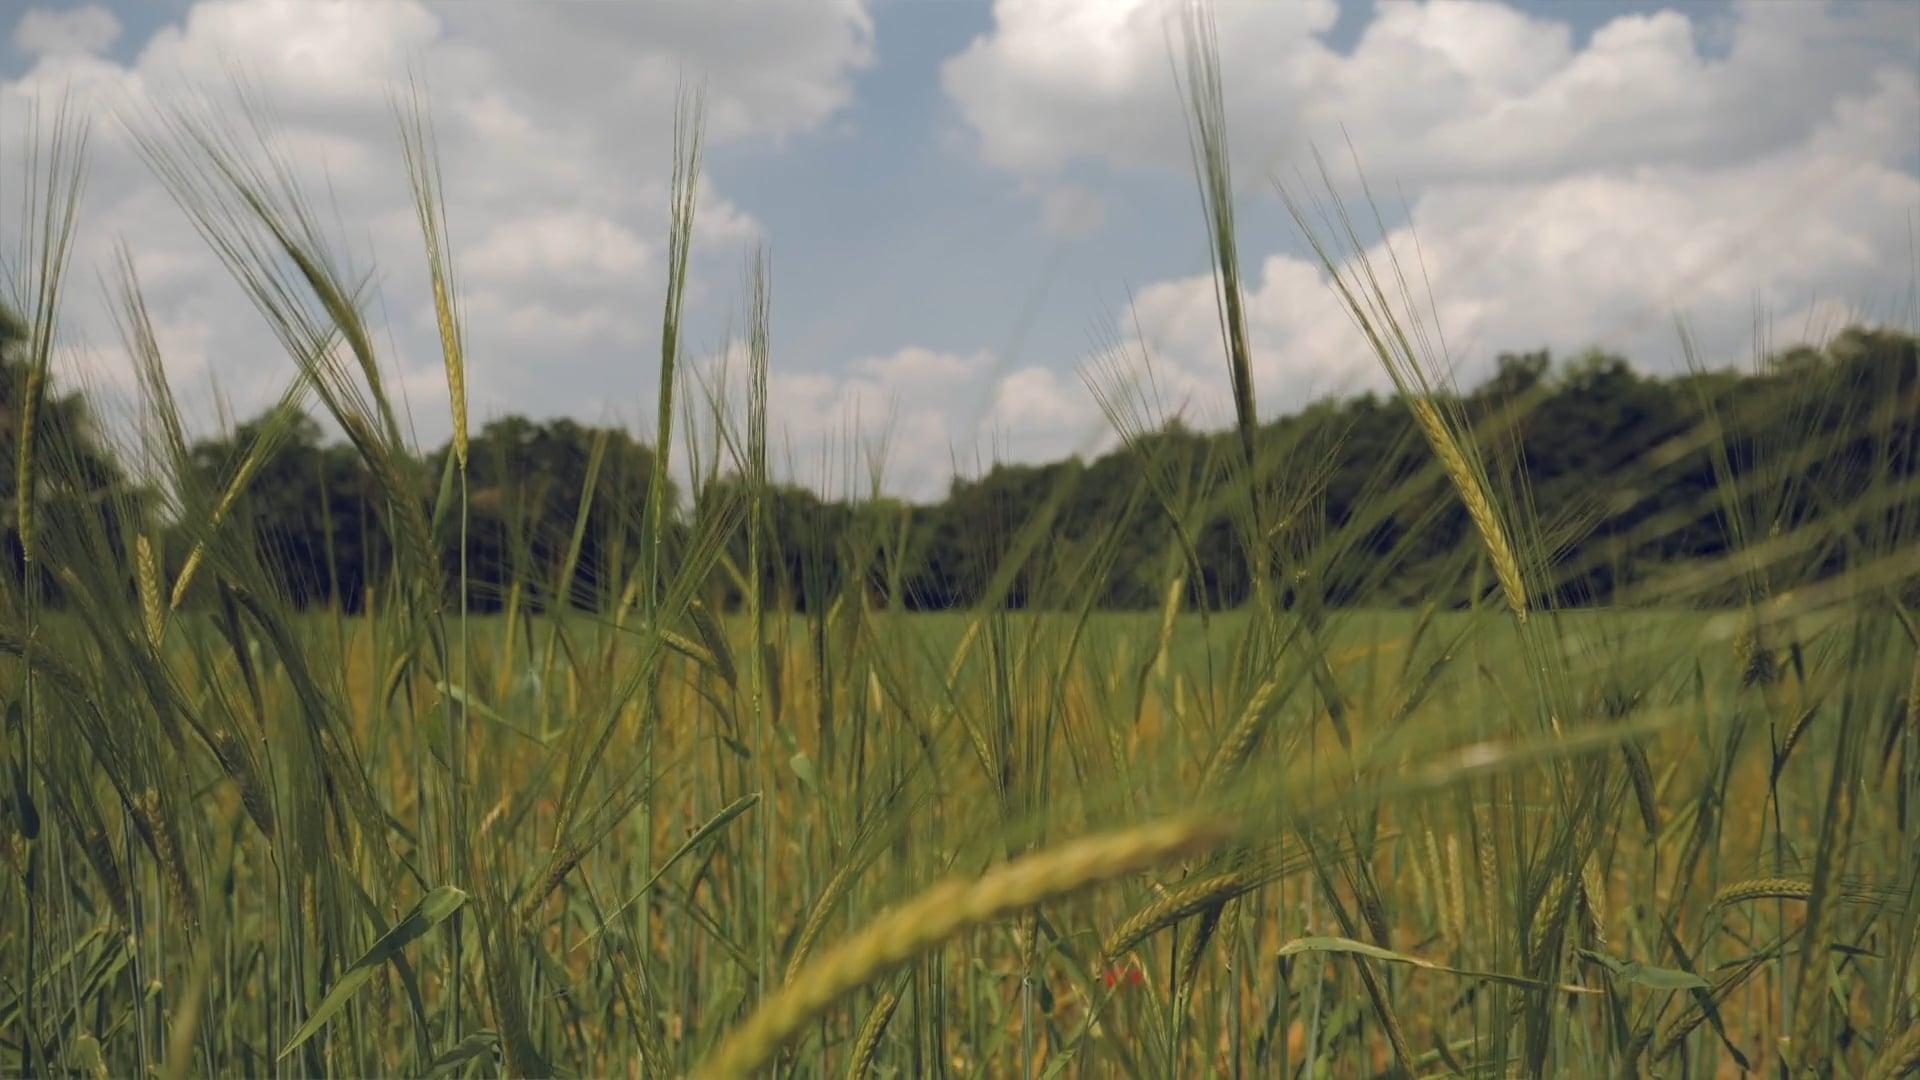 Cereal - Reinassance in the Field - Teaser